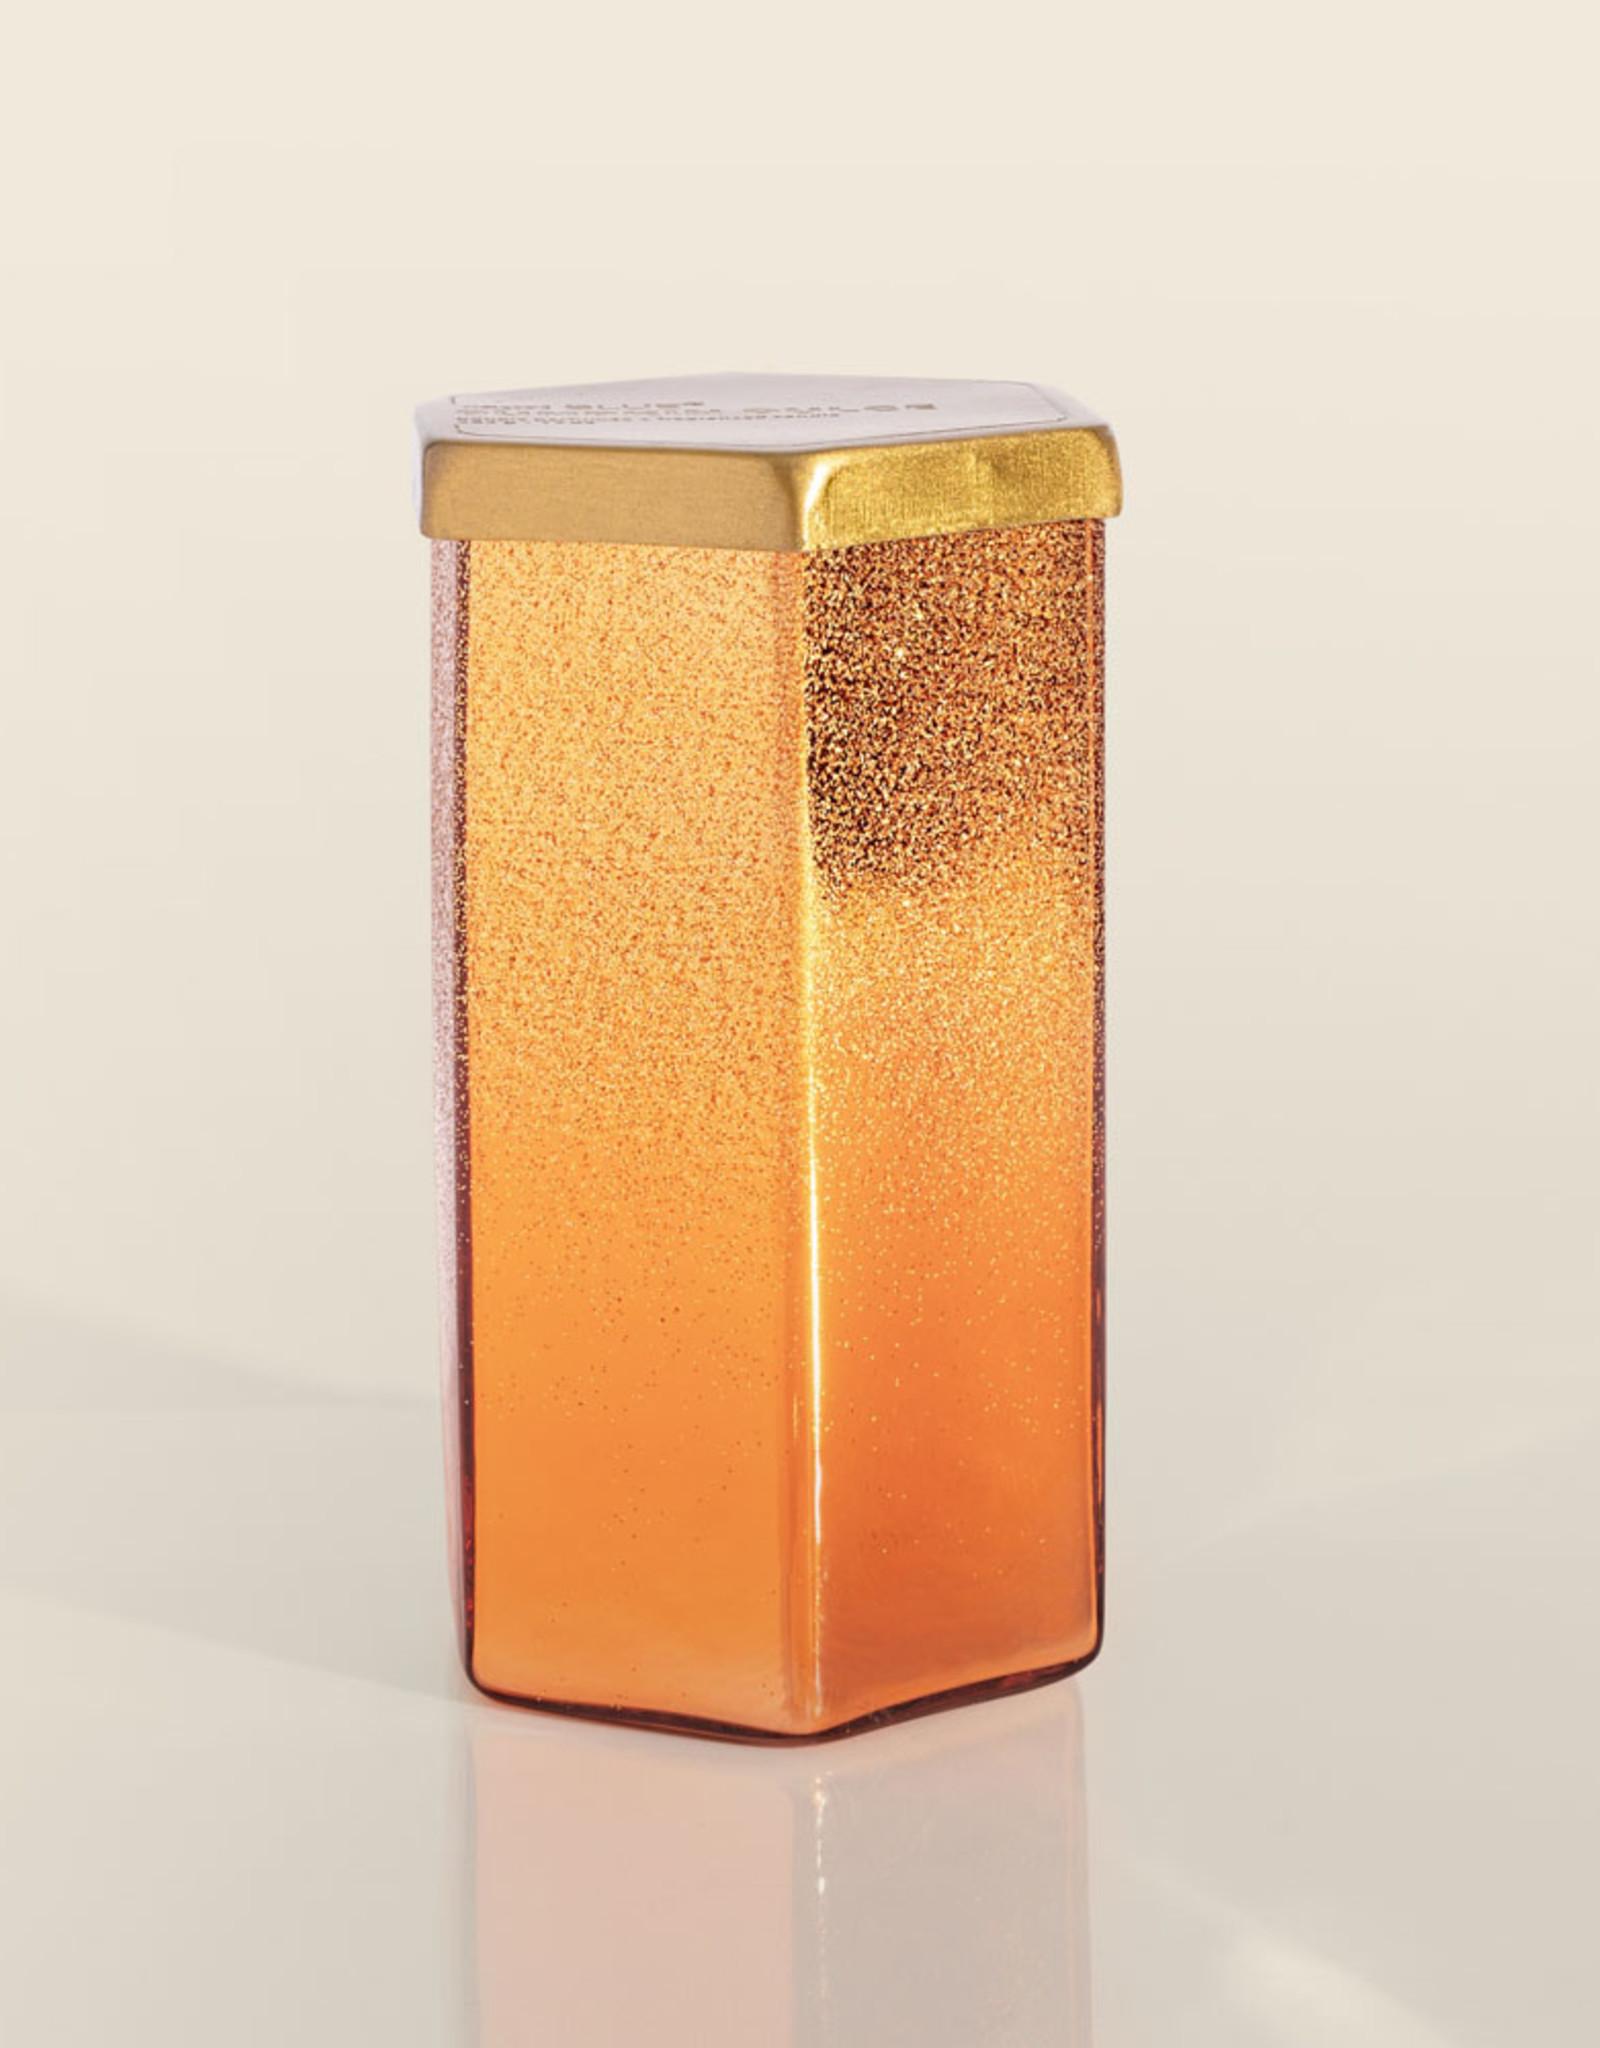 Pumpkin Dulce Copper Glittered Ombre Hexagon Candle